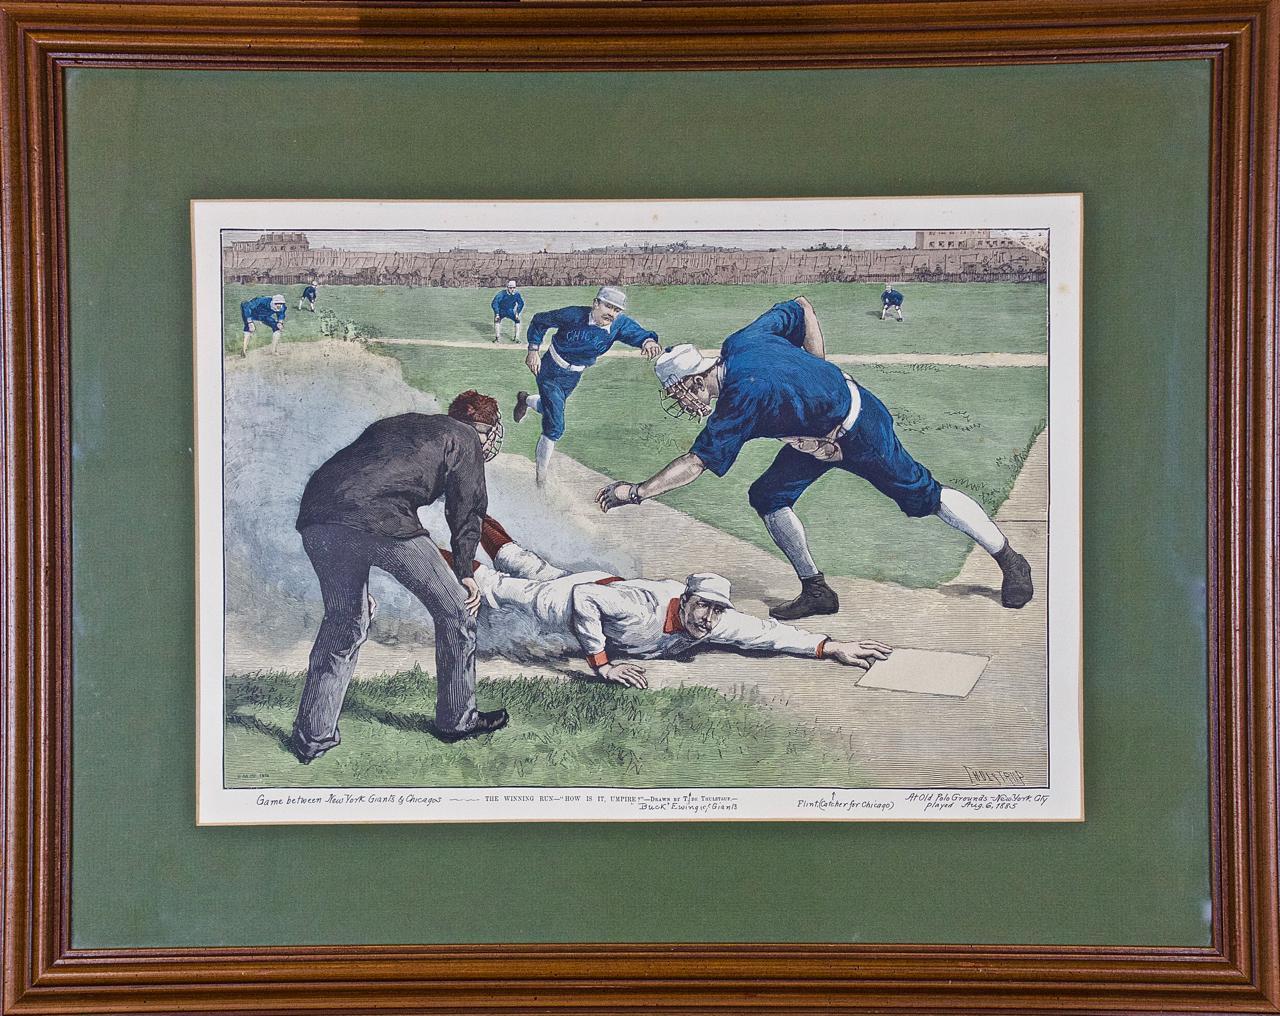 "1885 NY Giants vs. Chicago Baseball Scene ""The Winning Run, How is it, Umpire?"""